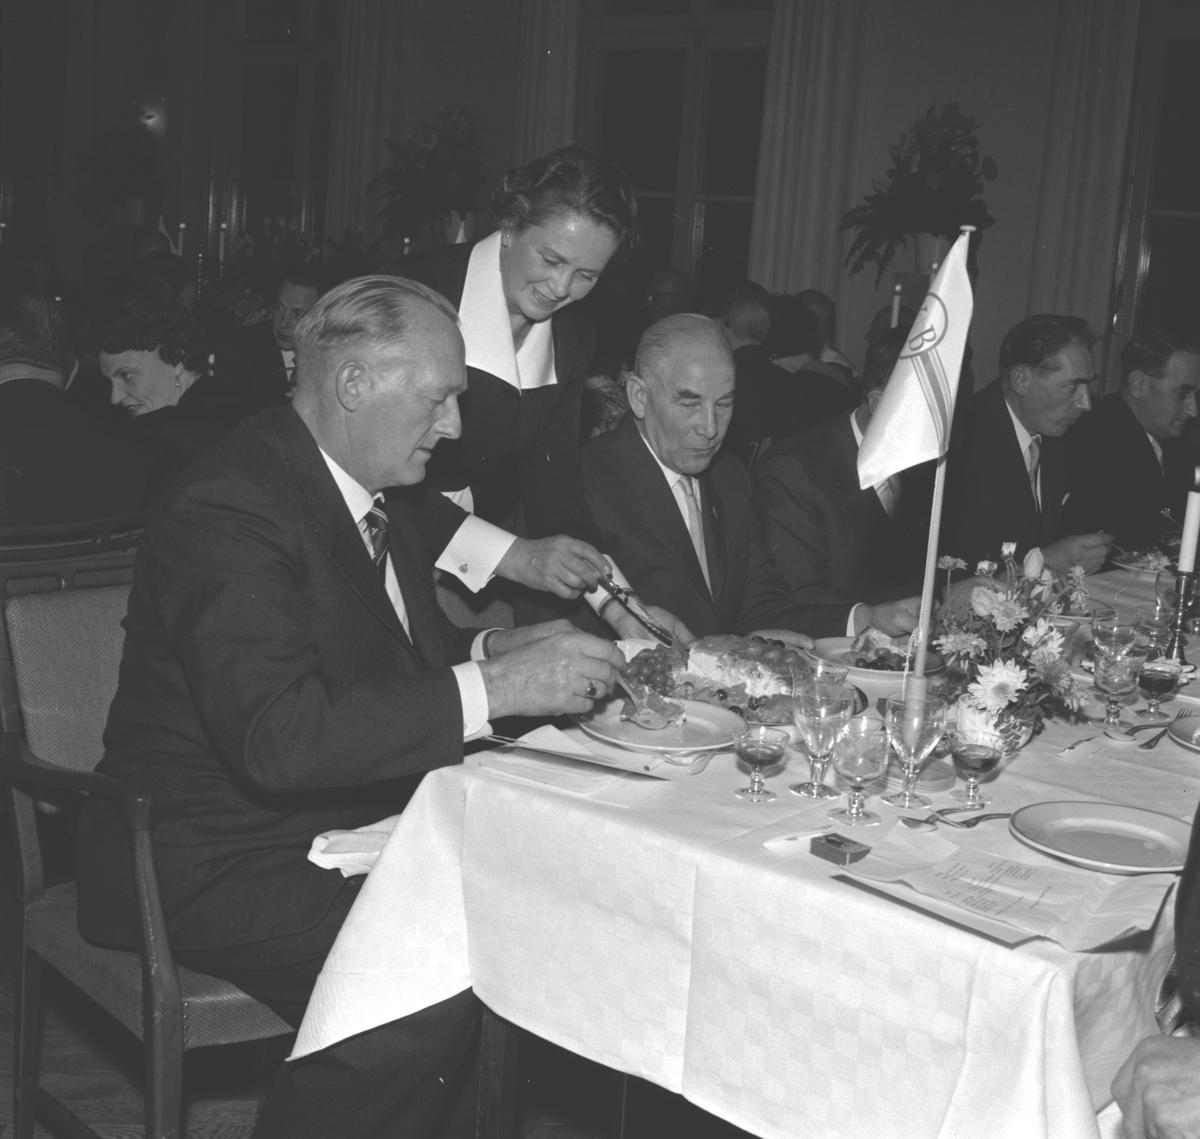 Middag i Föreningshuset. Verkställande direktör Erik Wilhelm Eriksson slutar. Korsnäs AB